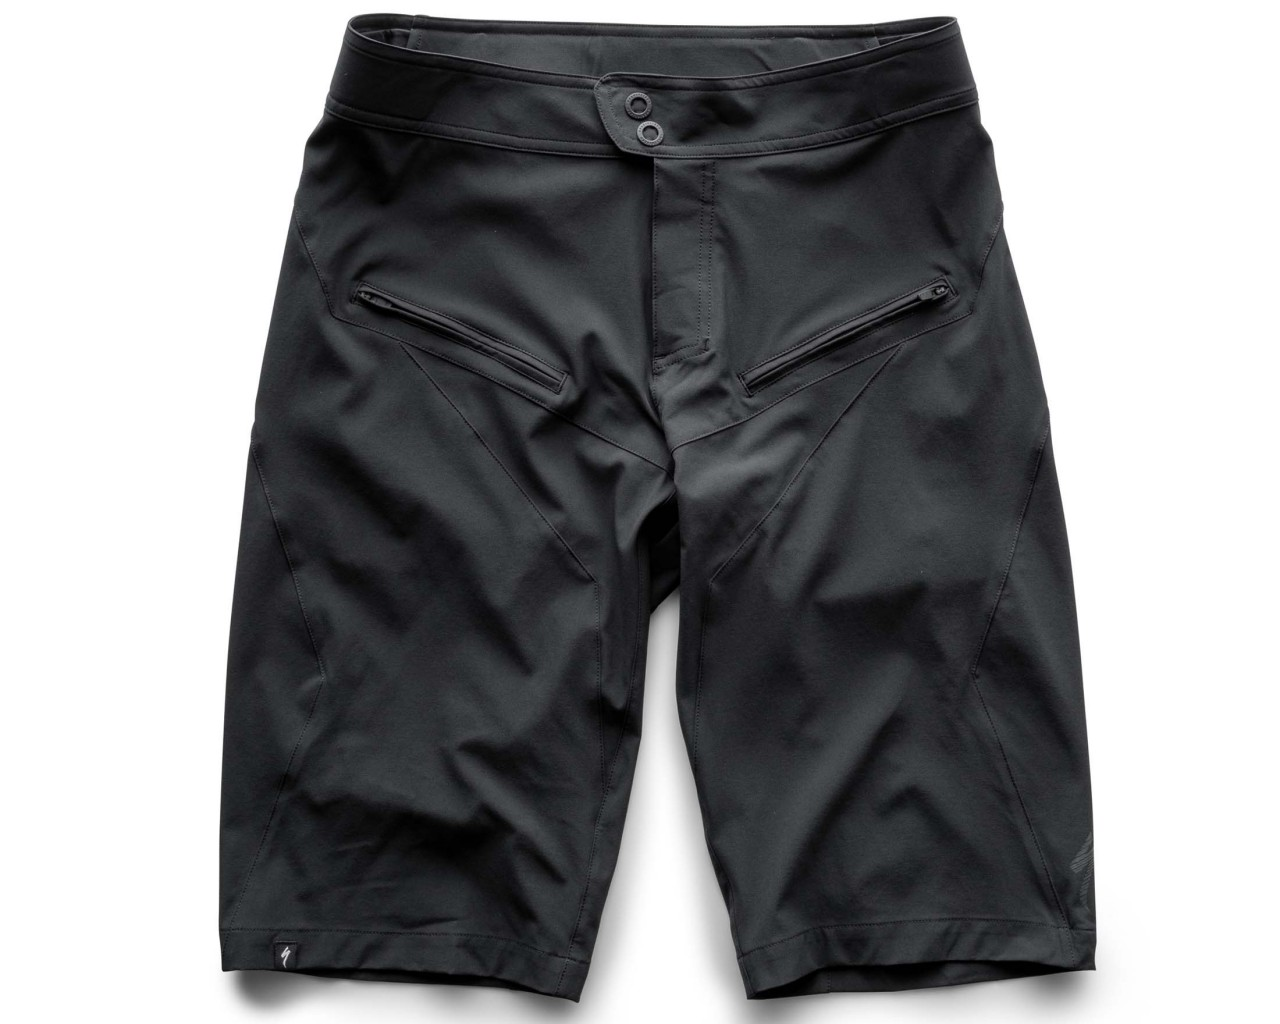 Specialized Atlas XC Comp Short | black